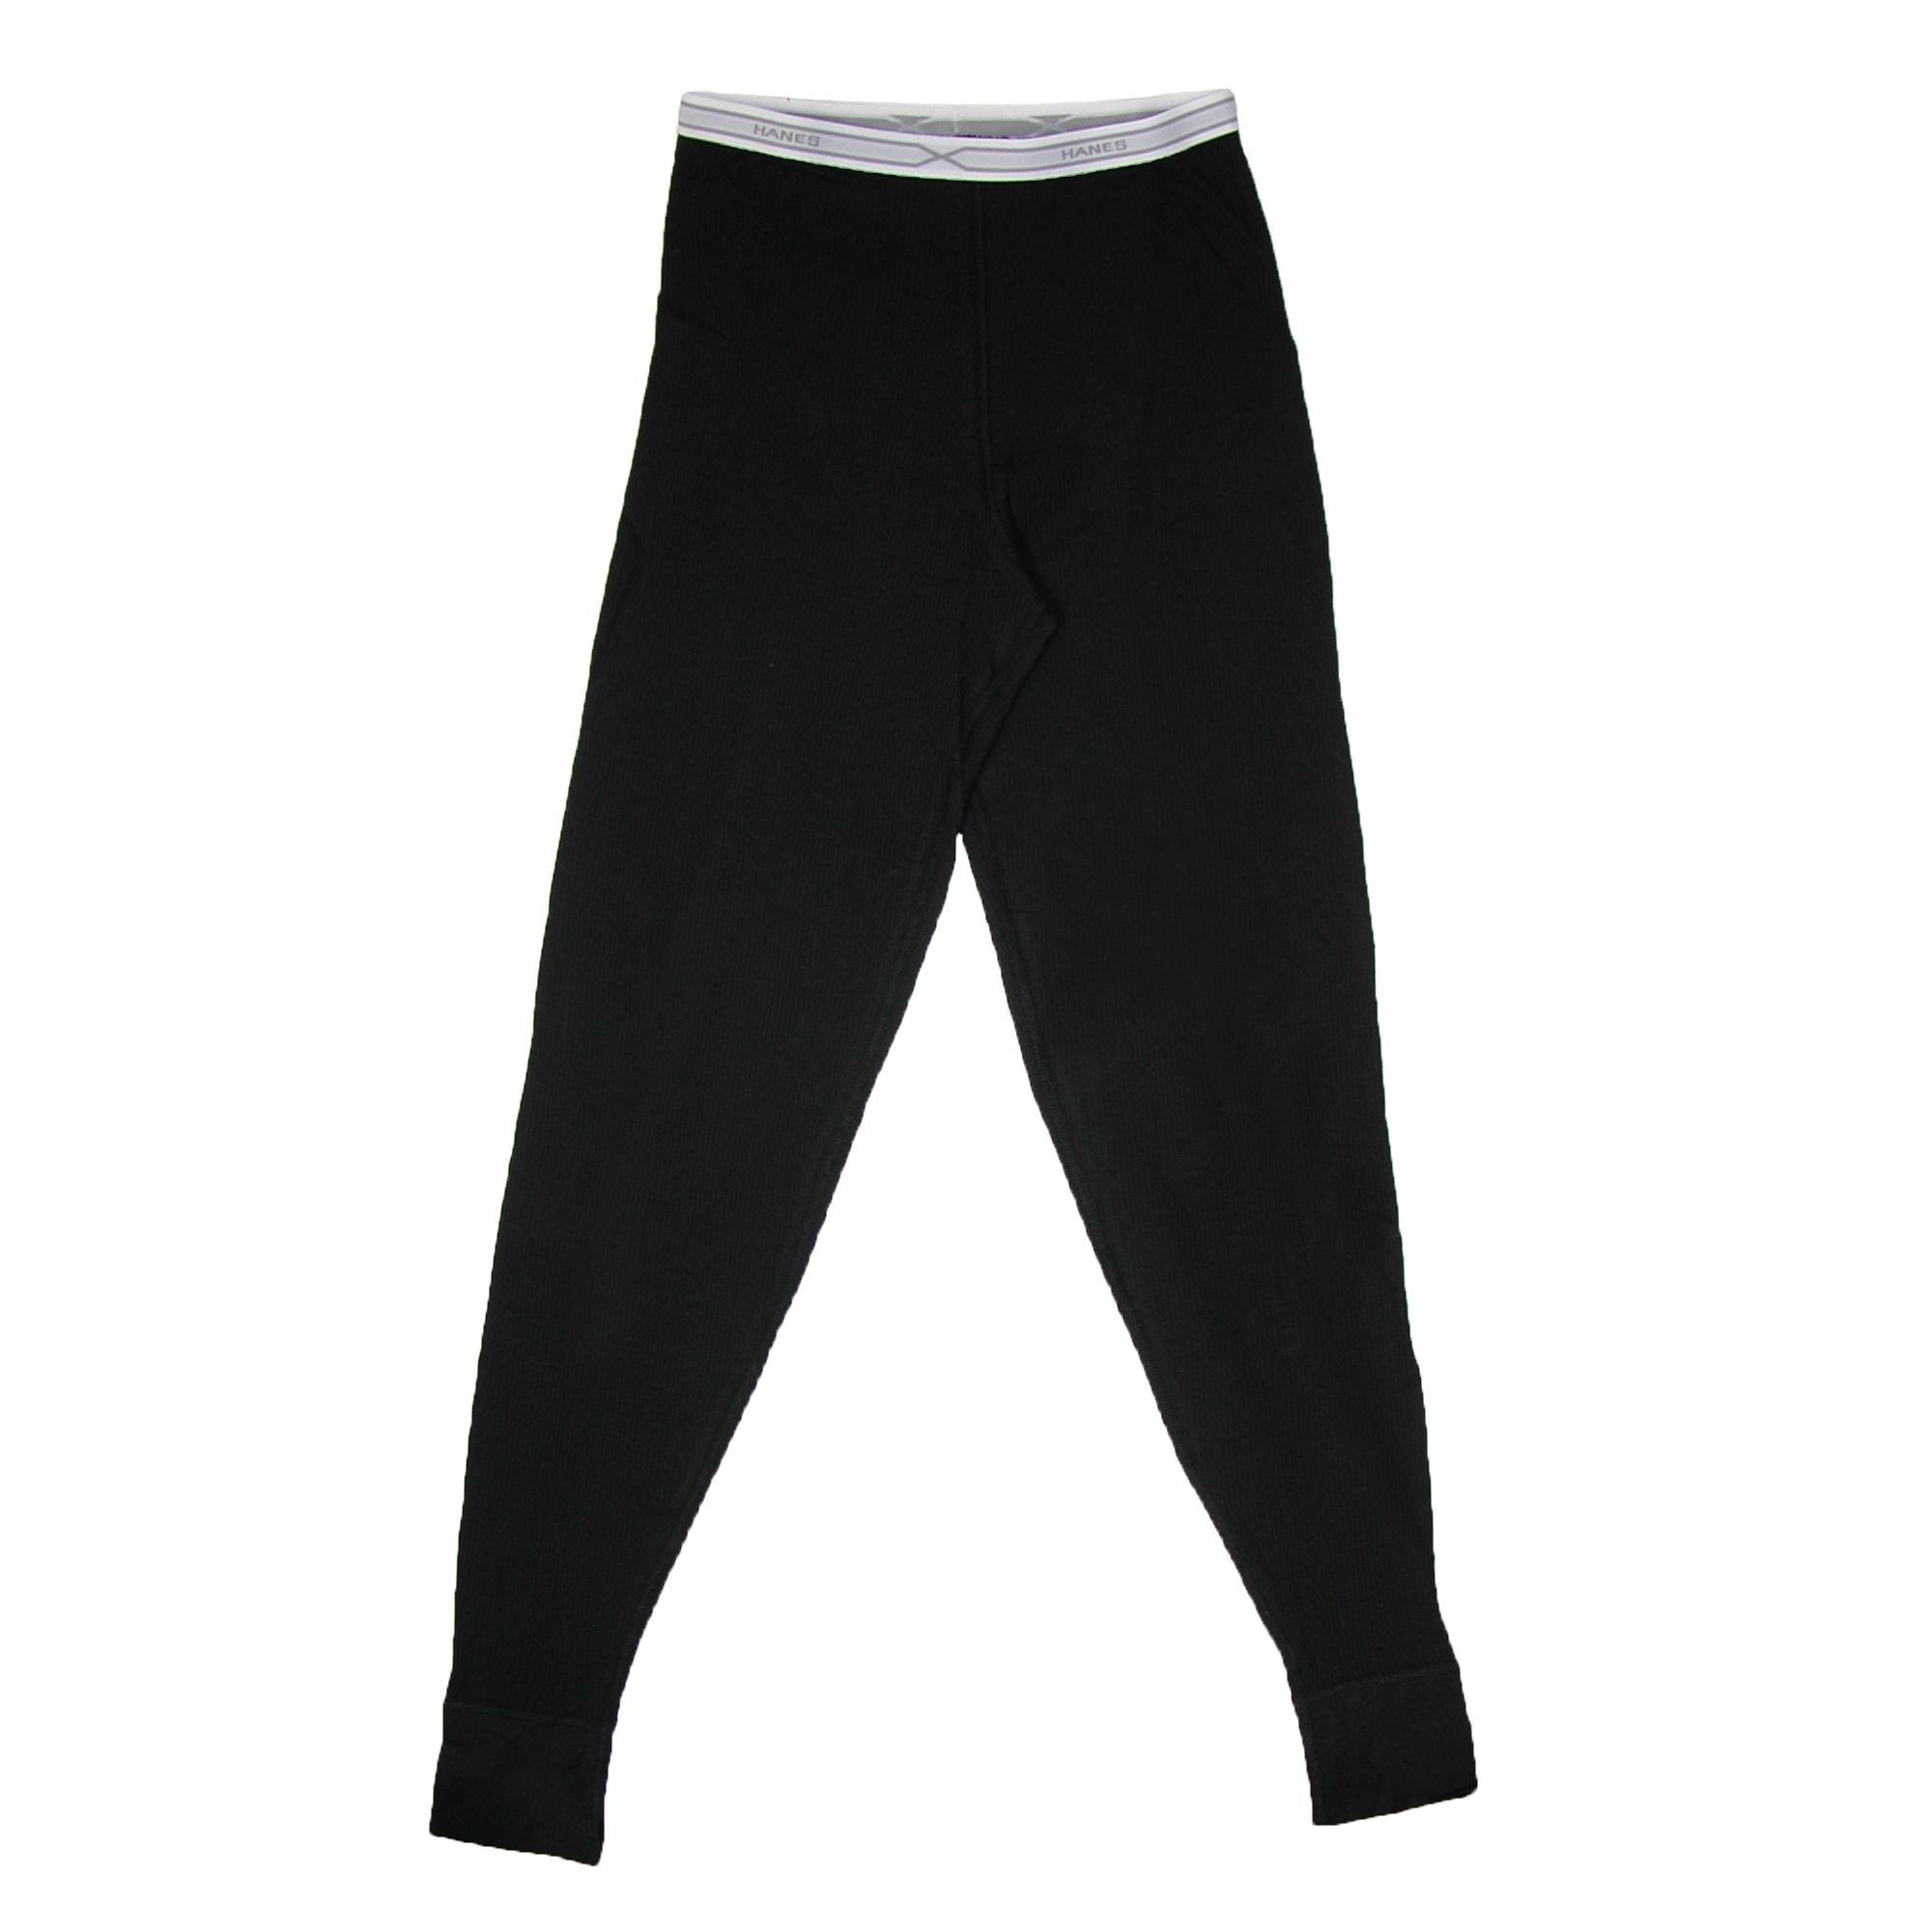 Hanes Womens Thermal Pants